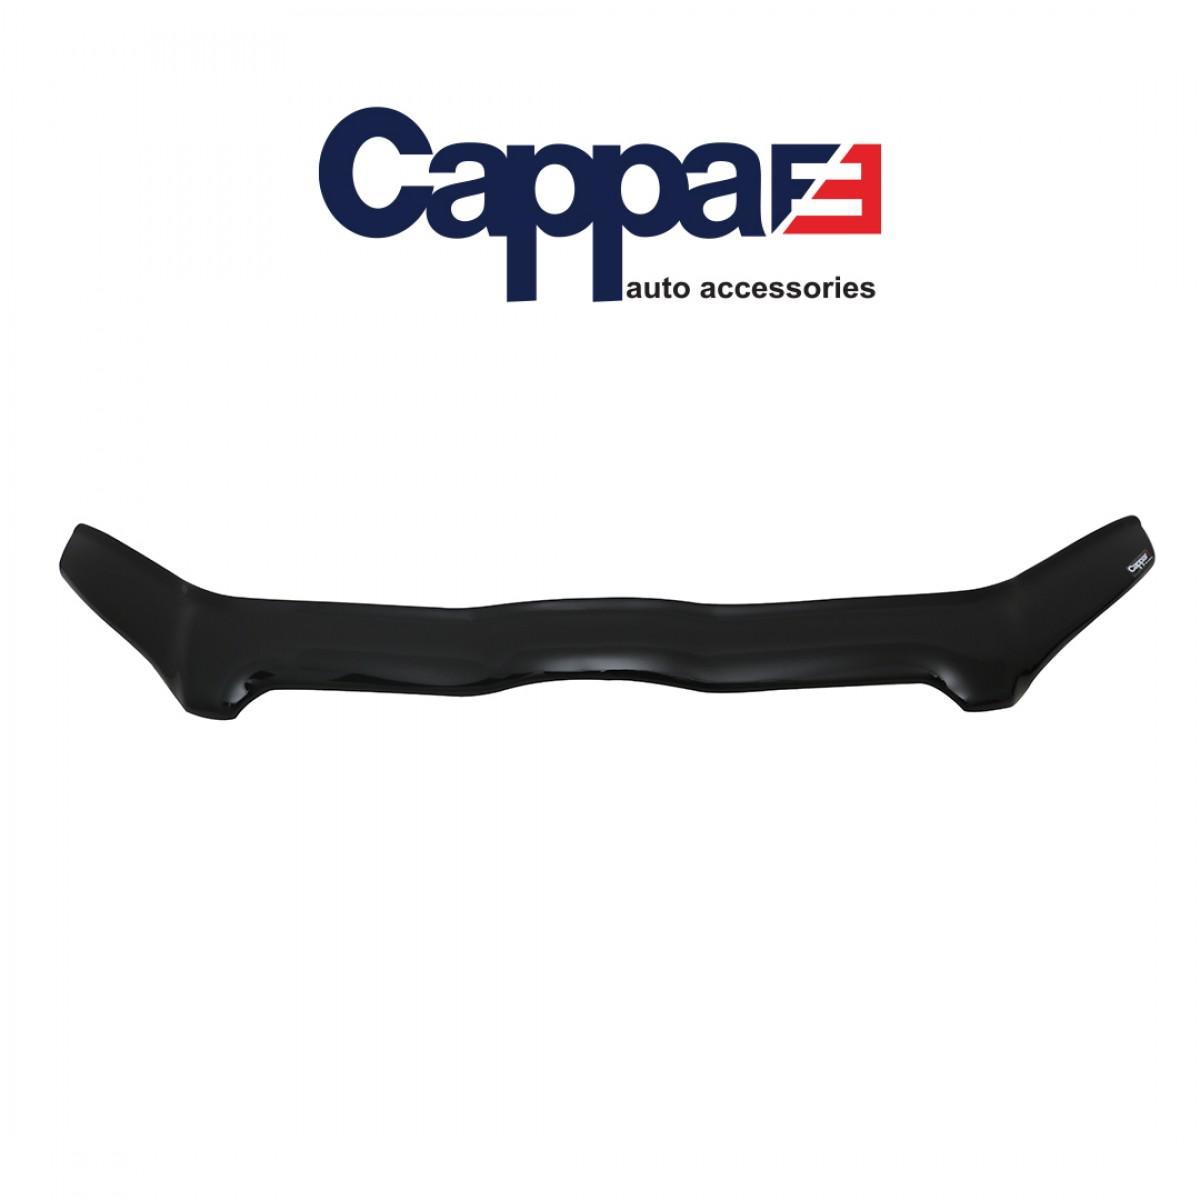 CAPPAFE Skoda Yeti Ön Kaput Koruma Rüzgarlığı 4mm ABS 2009 - 2013